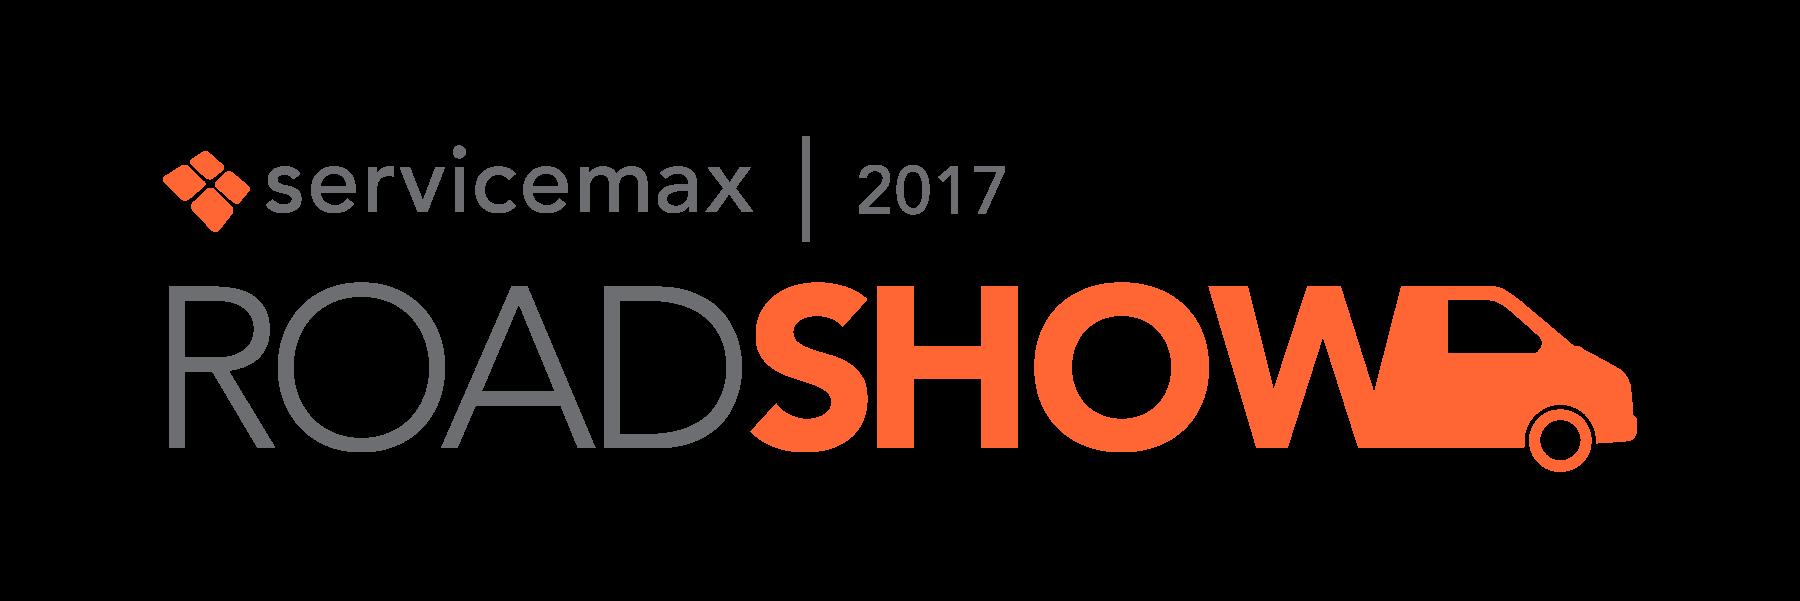 servicemax_roadshow-logo_greye3289ce413b06300b1cfff000026d68d